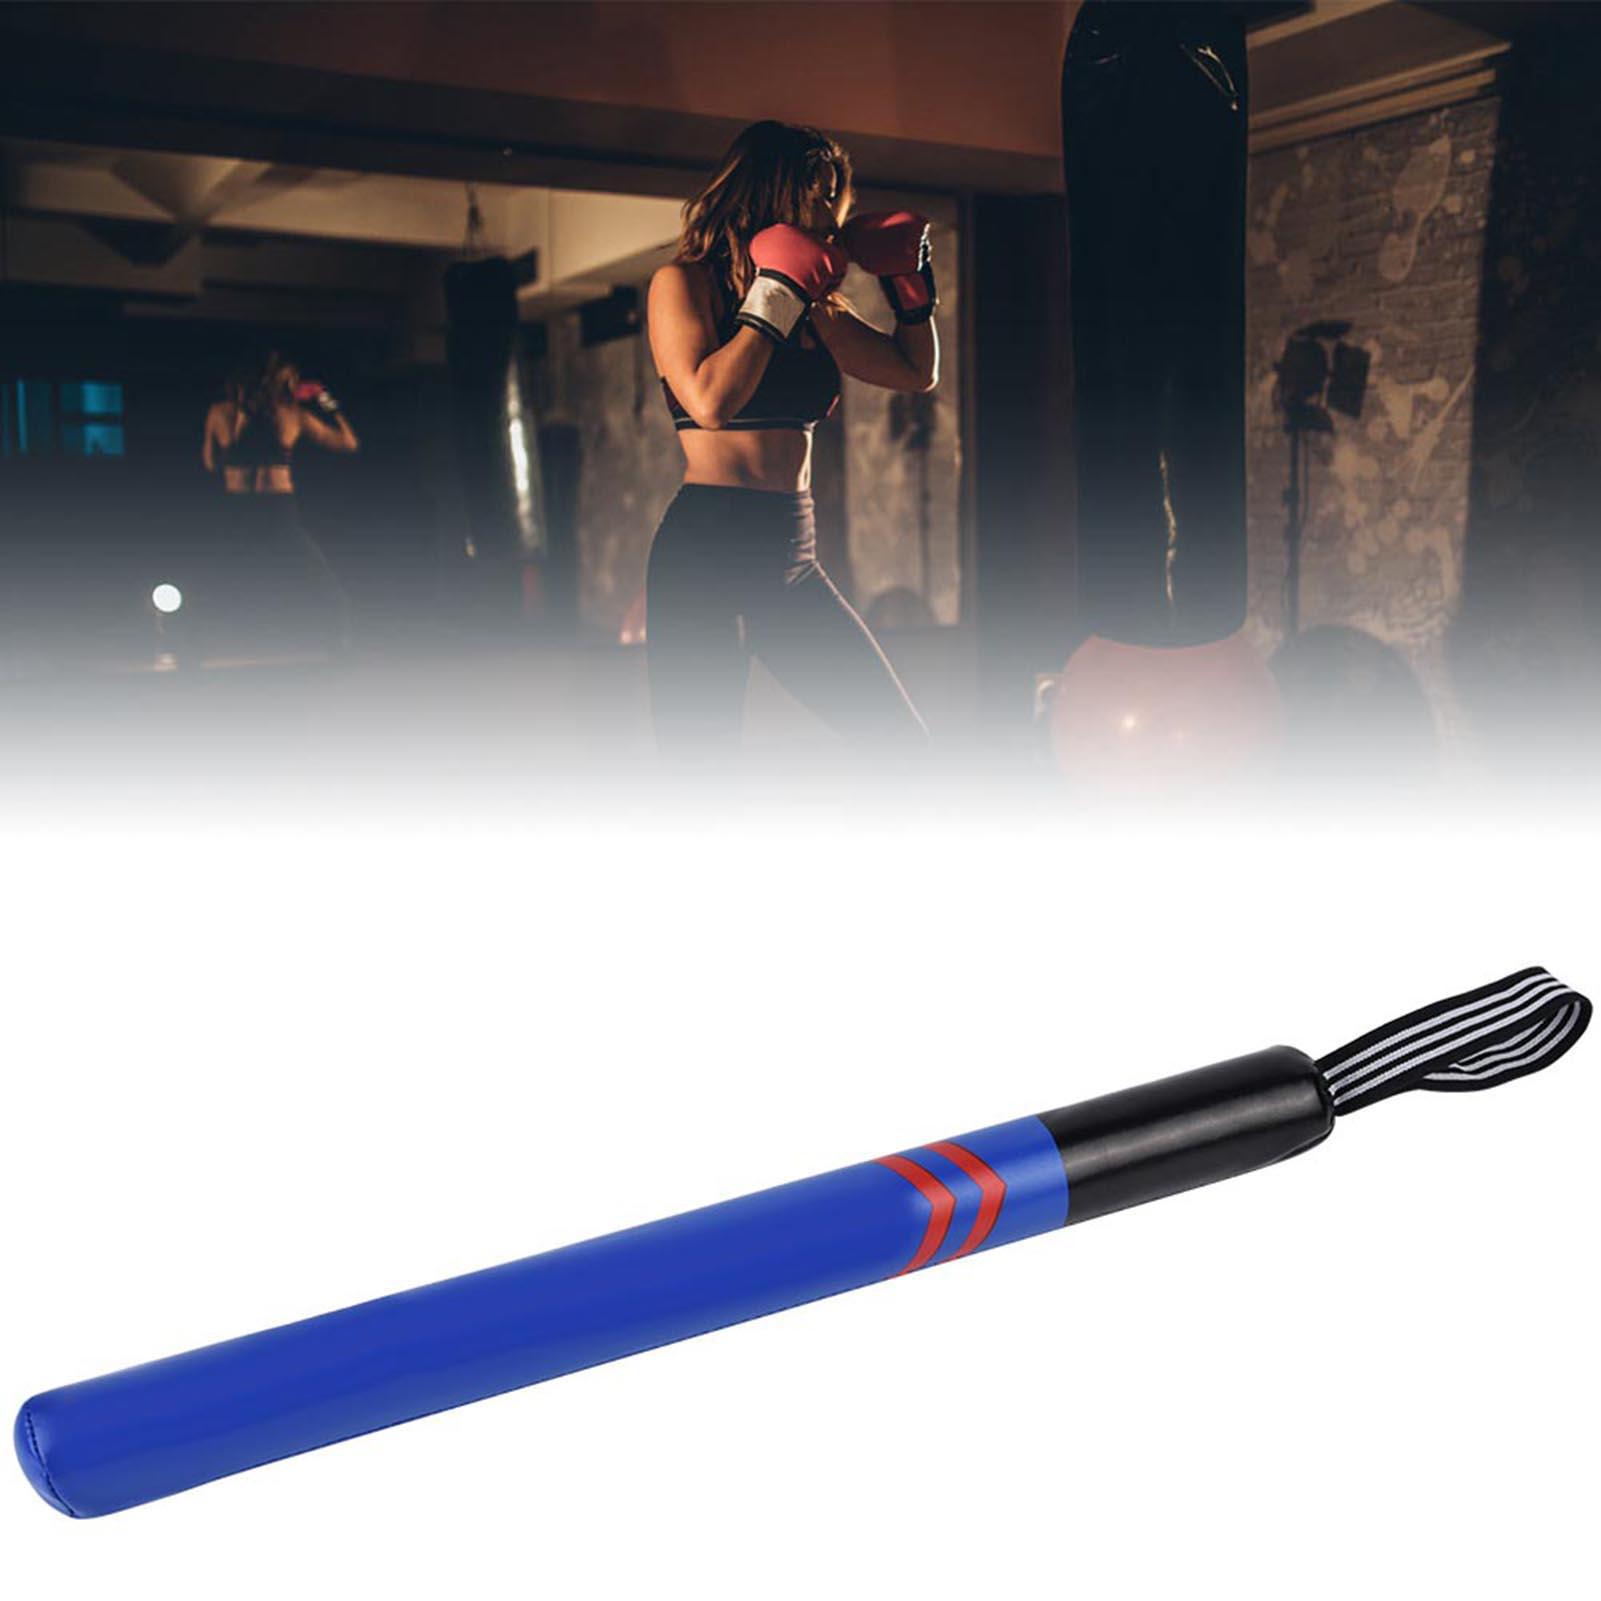 Blue Boxing Stick Target Box Training Tool Fitness Equipment Striking Sticks